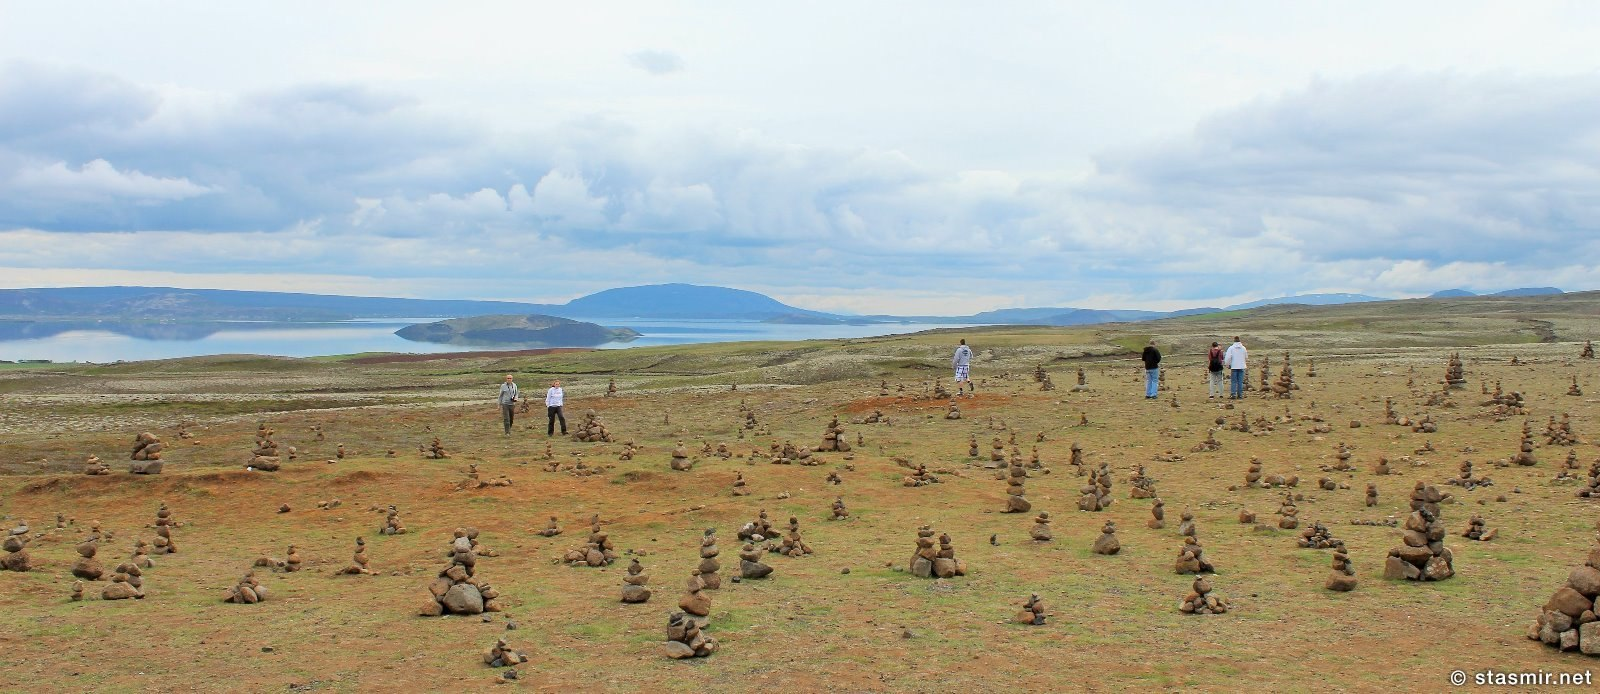 Пирамидки у озера Тингватлаватн, Исландия, фото Стасмир, Photo Stasmir